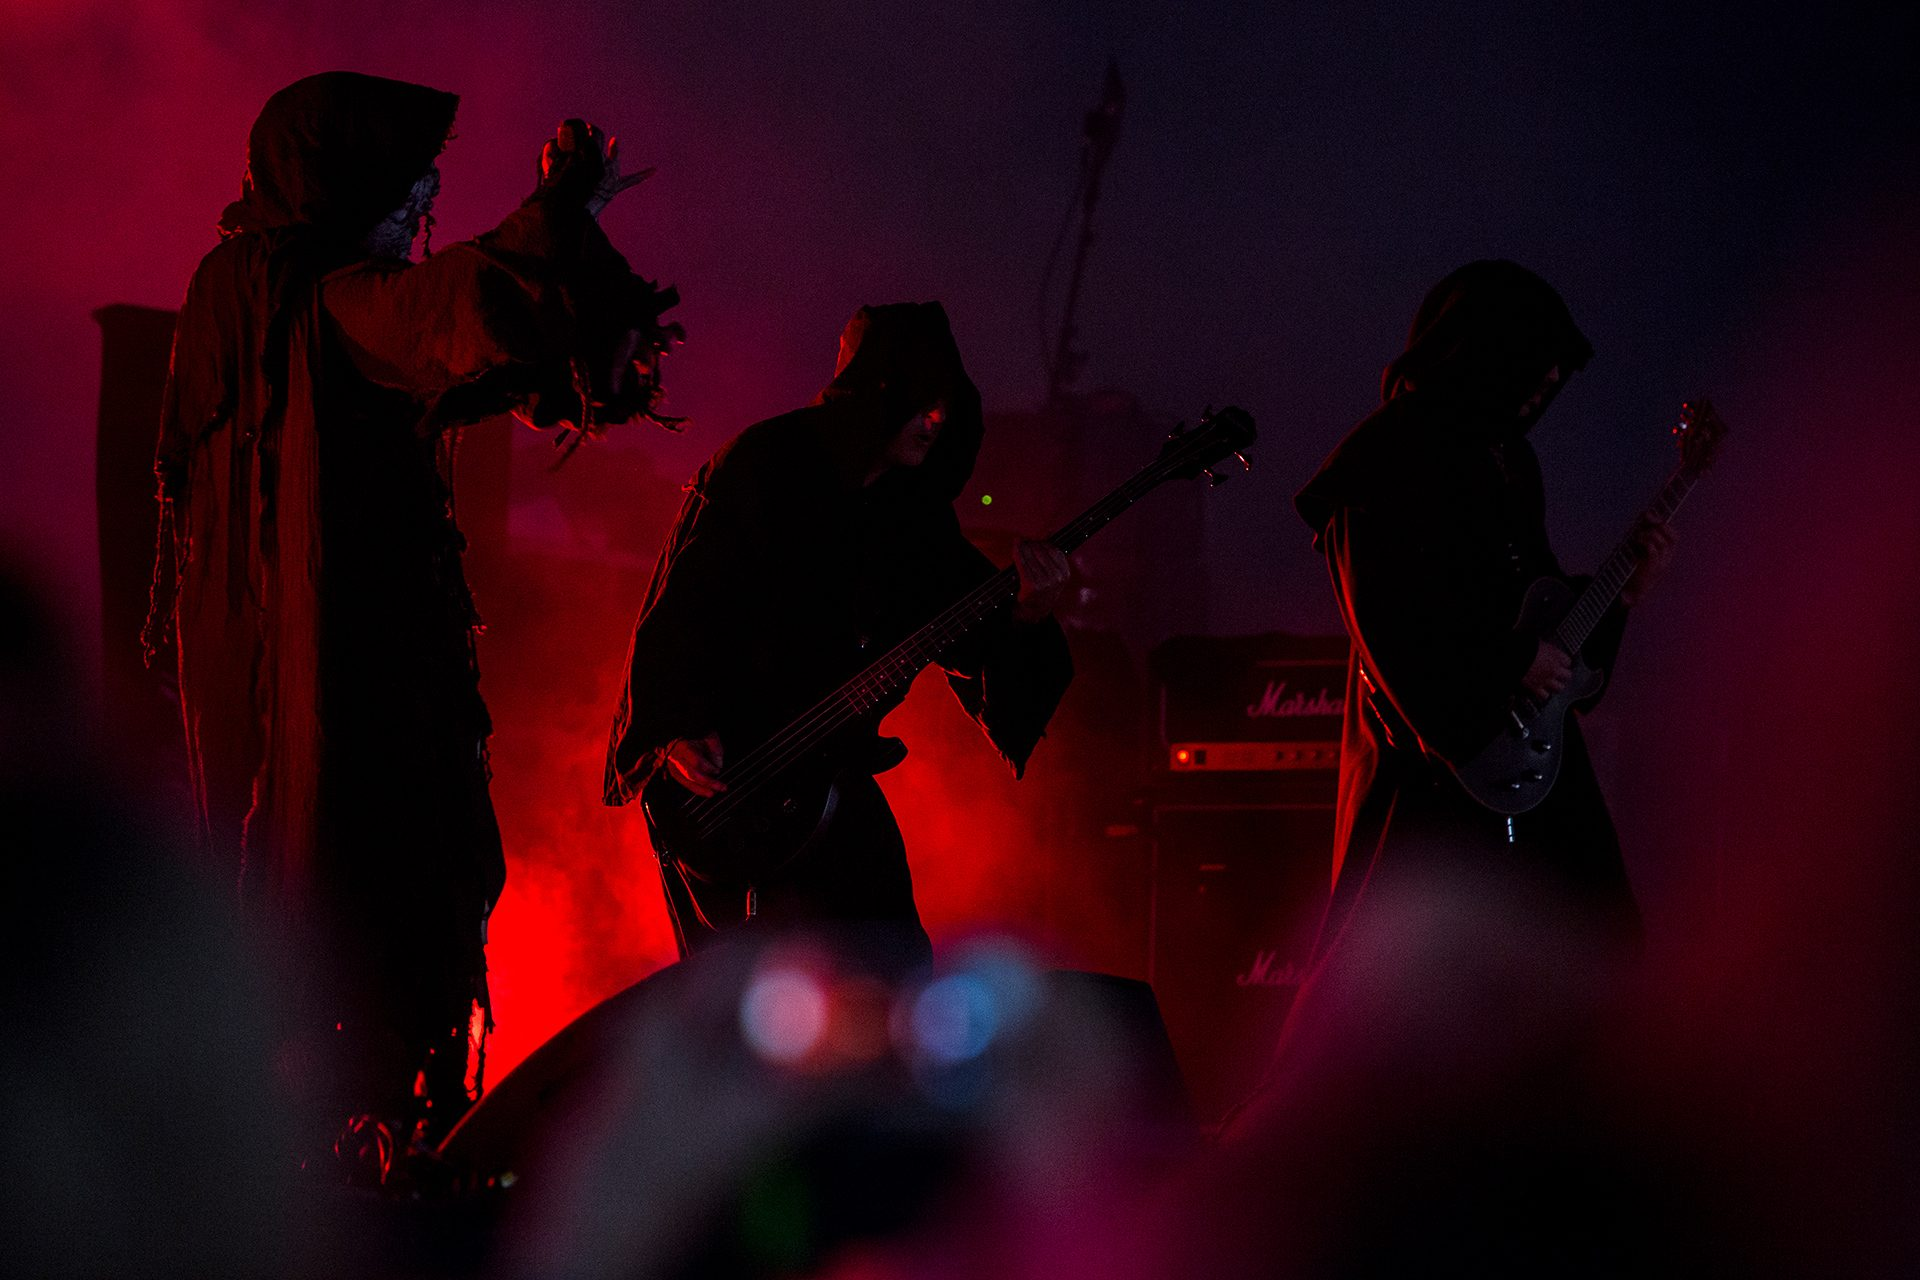 Jonas Åkerlund, Mayhem band, Tuska metal festival